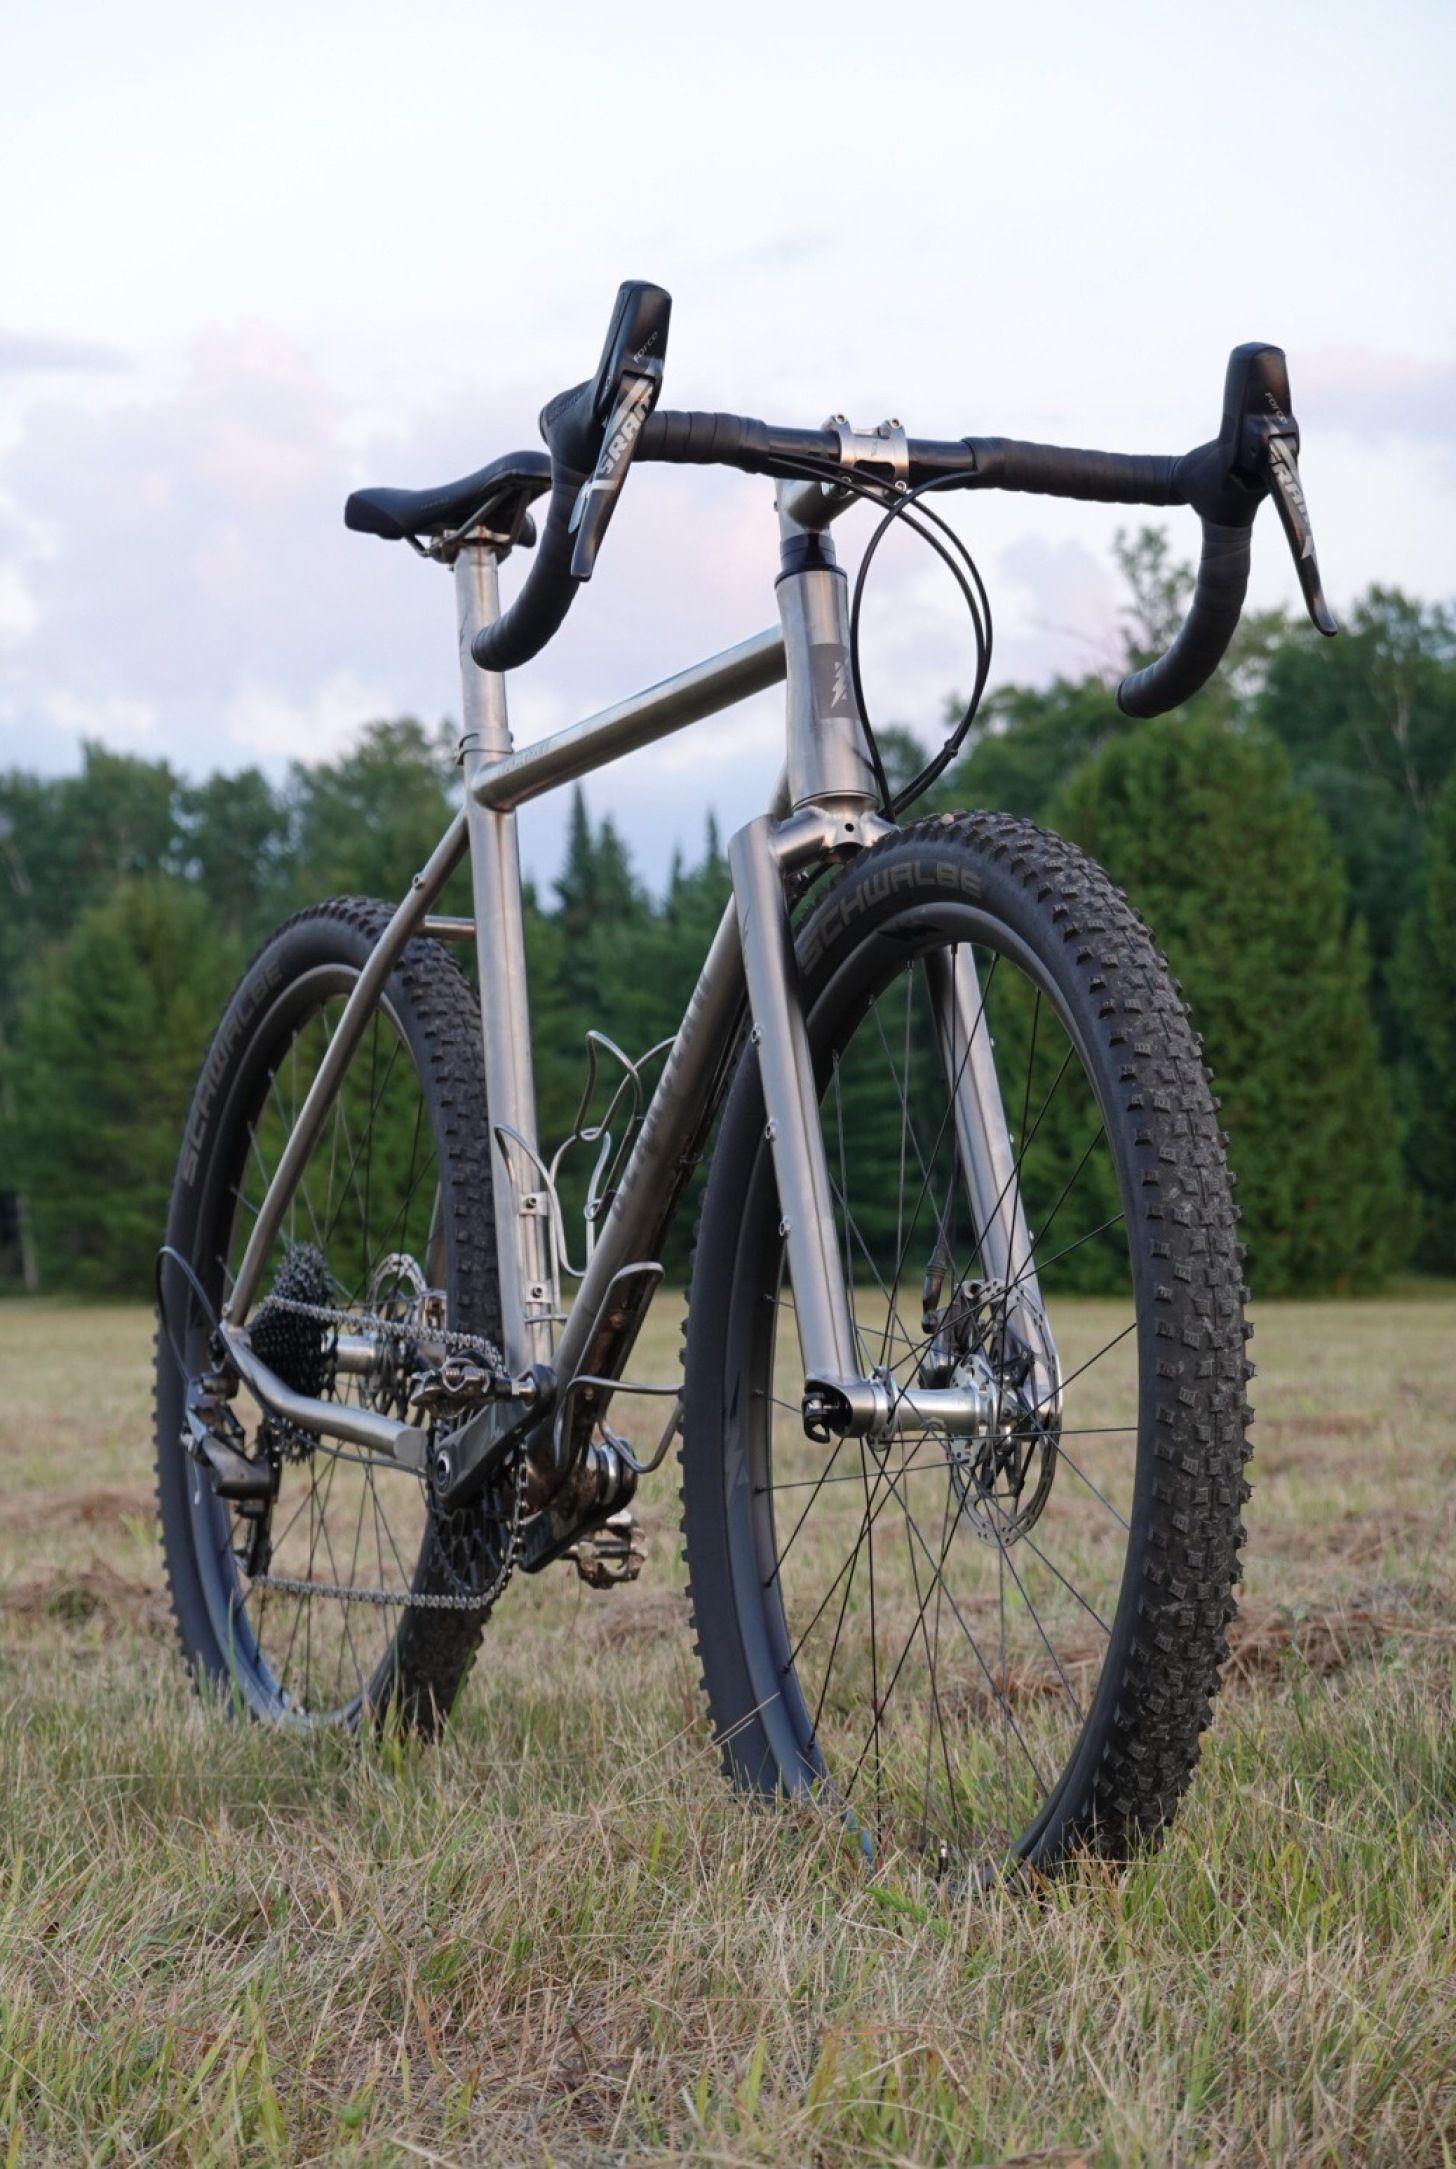 Thunderhawk Gravel Bike Bicycles Gravel Bike Titanium Bike